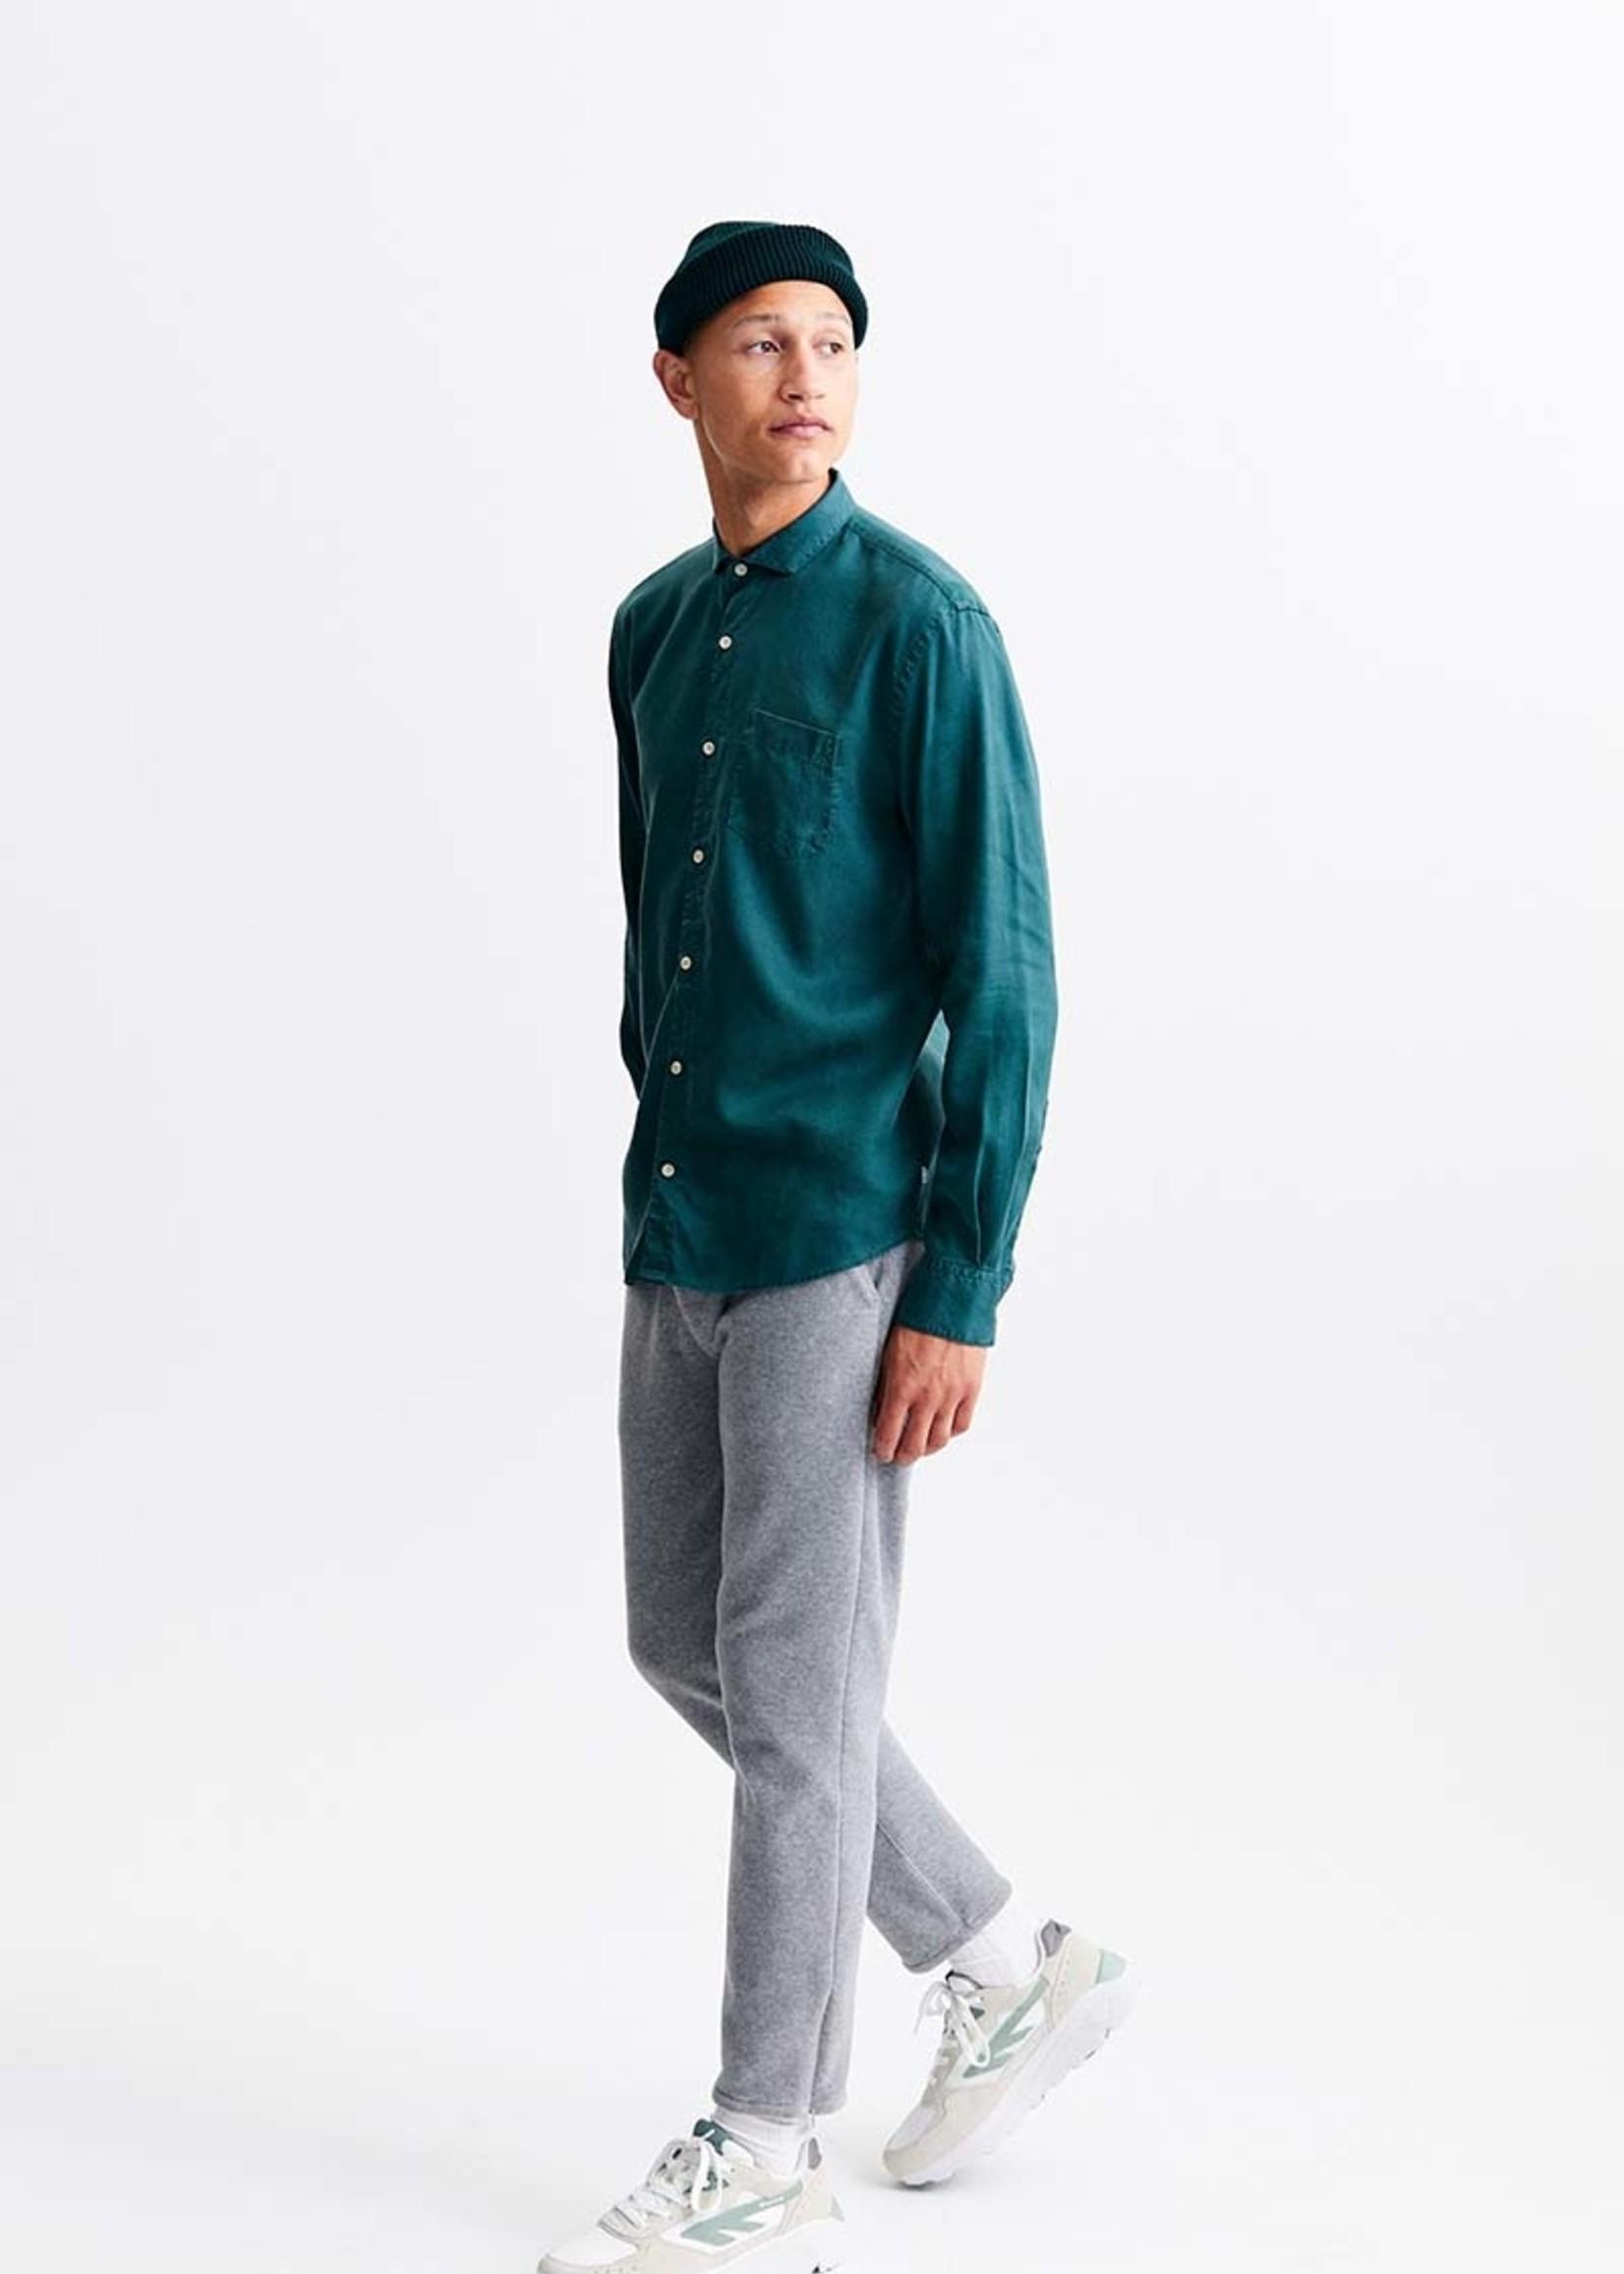 The GoodPeople Simon Shirt